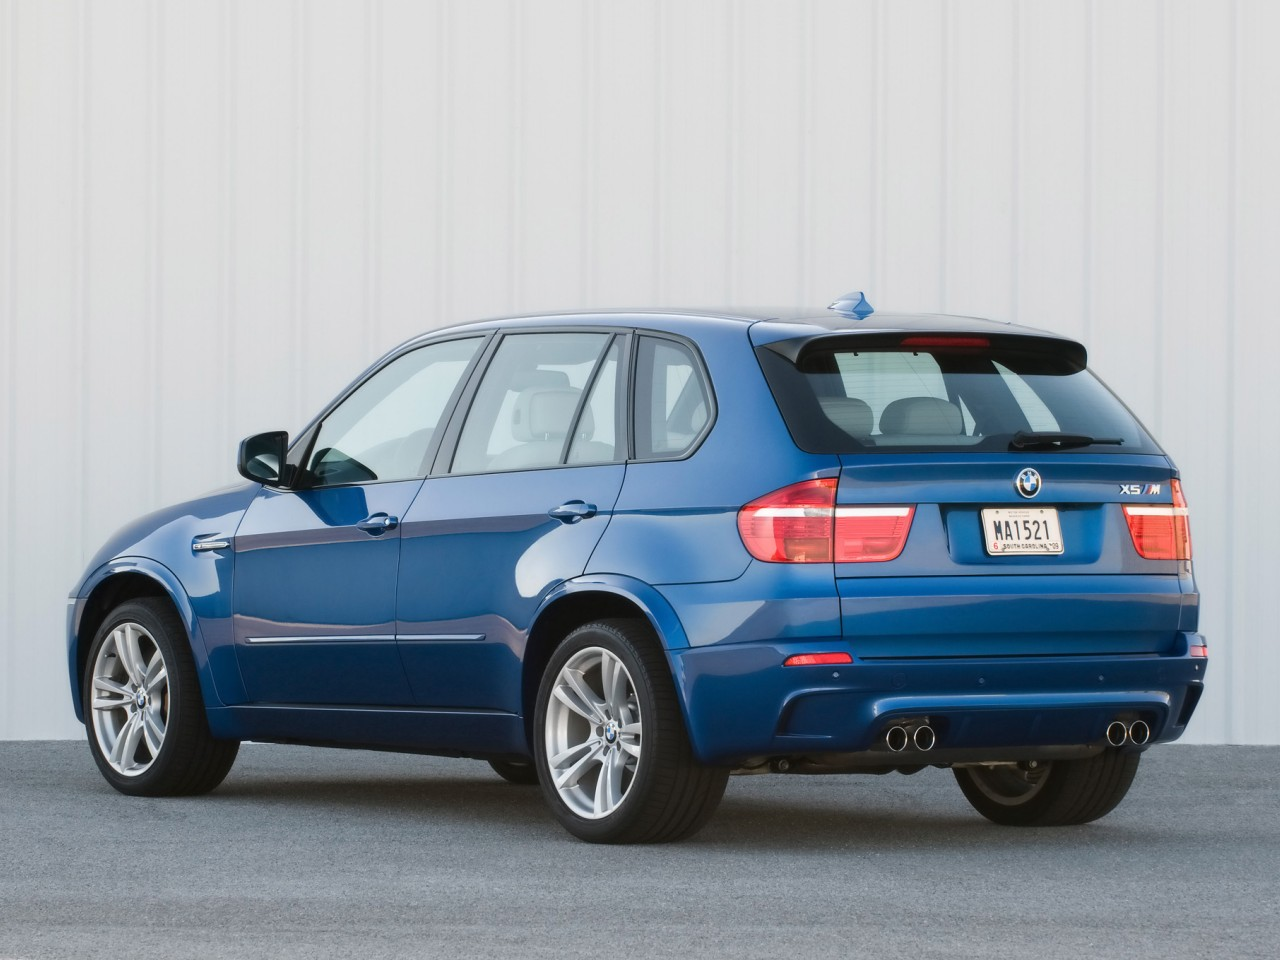 2009 BMW X5 M | Motor Desktop